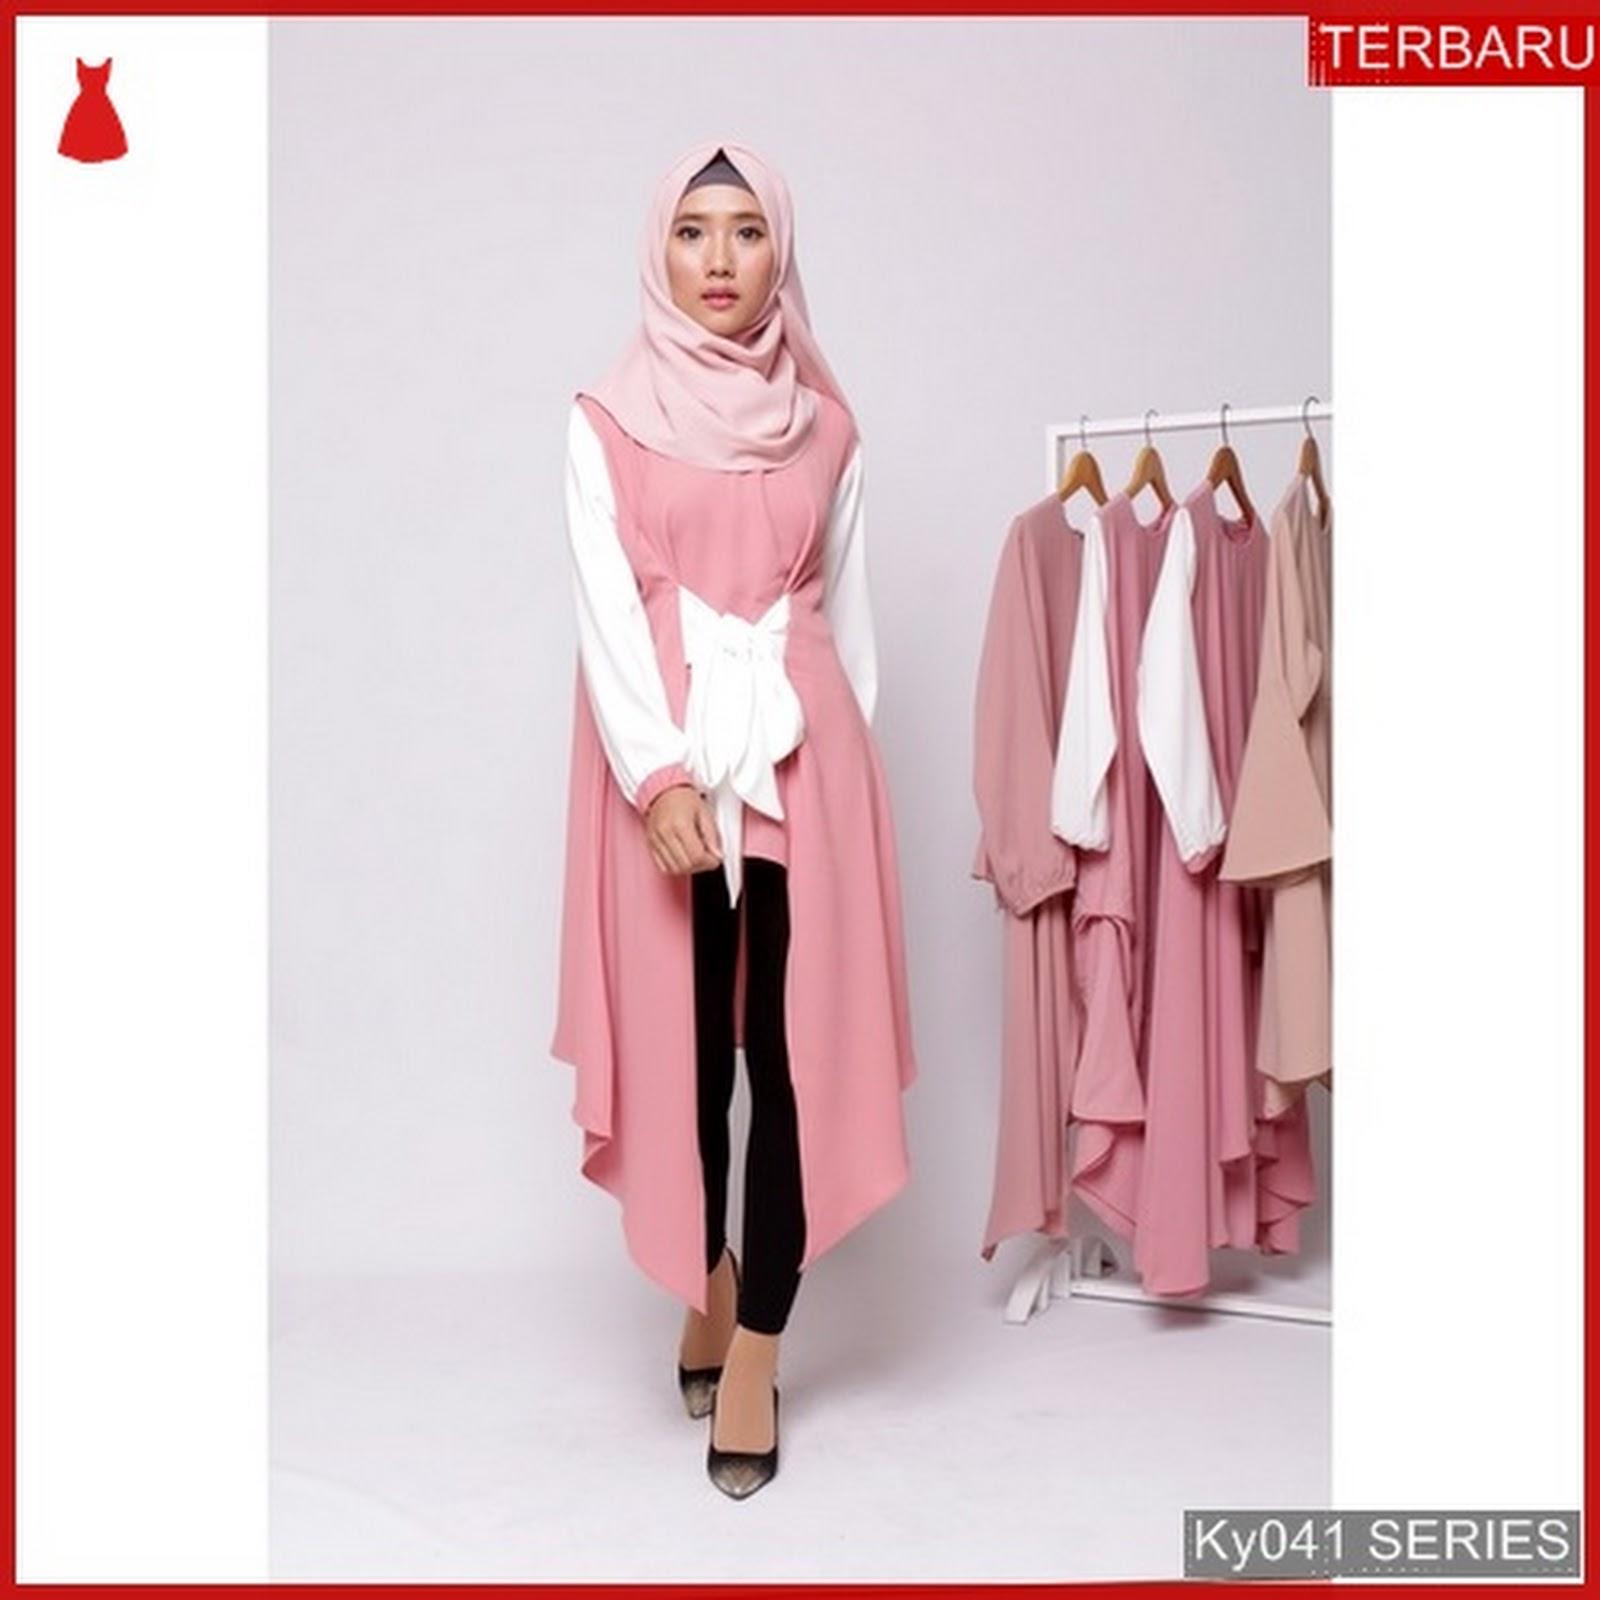 Dapatkan Baju Muslim Lebaran Paling Keren Terbaru Di BMG a7e3a35751